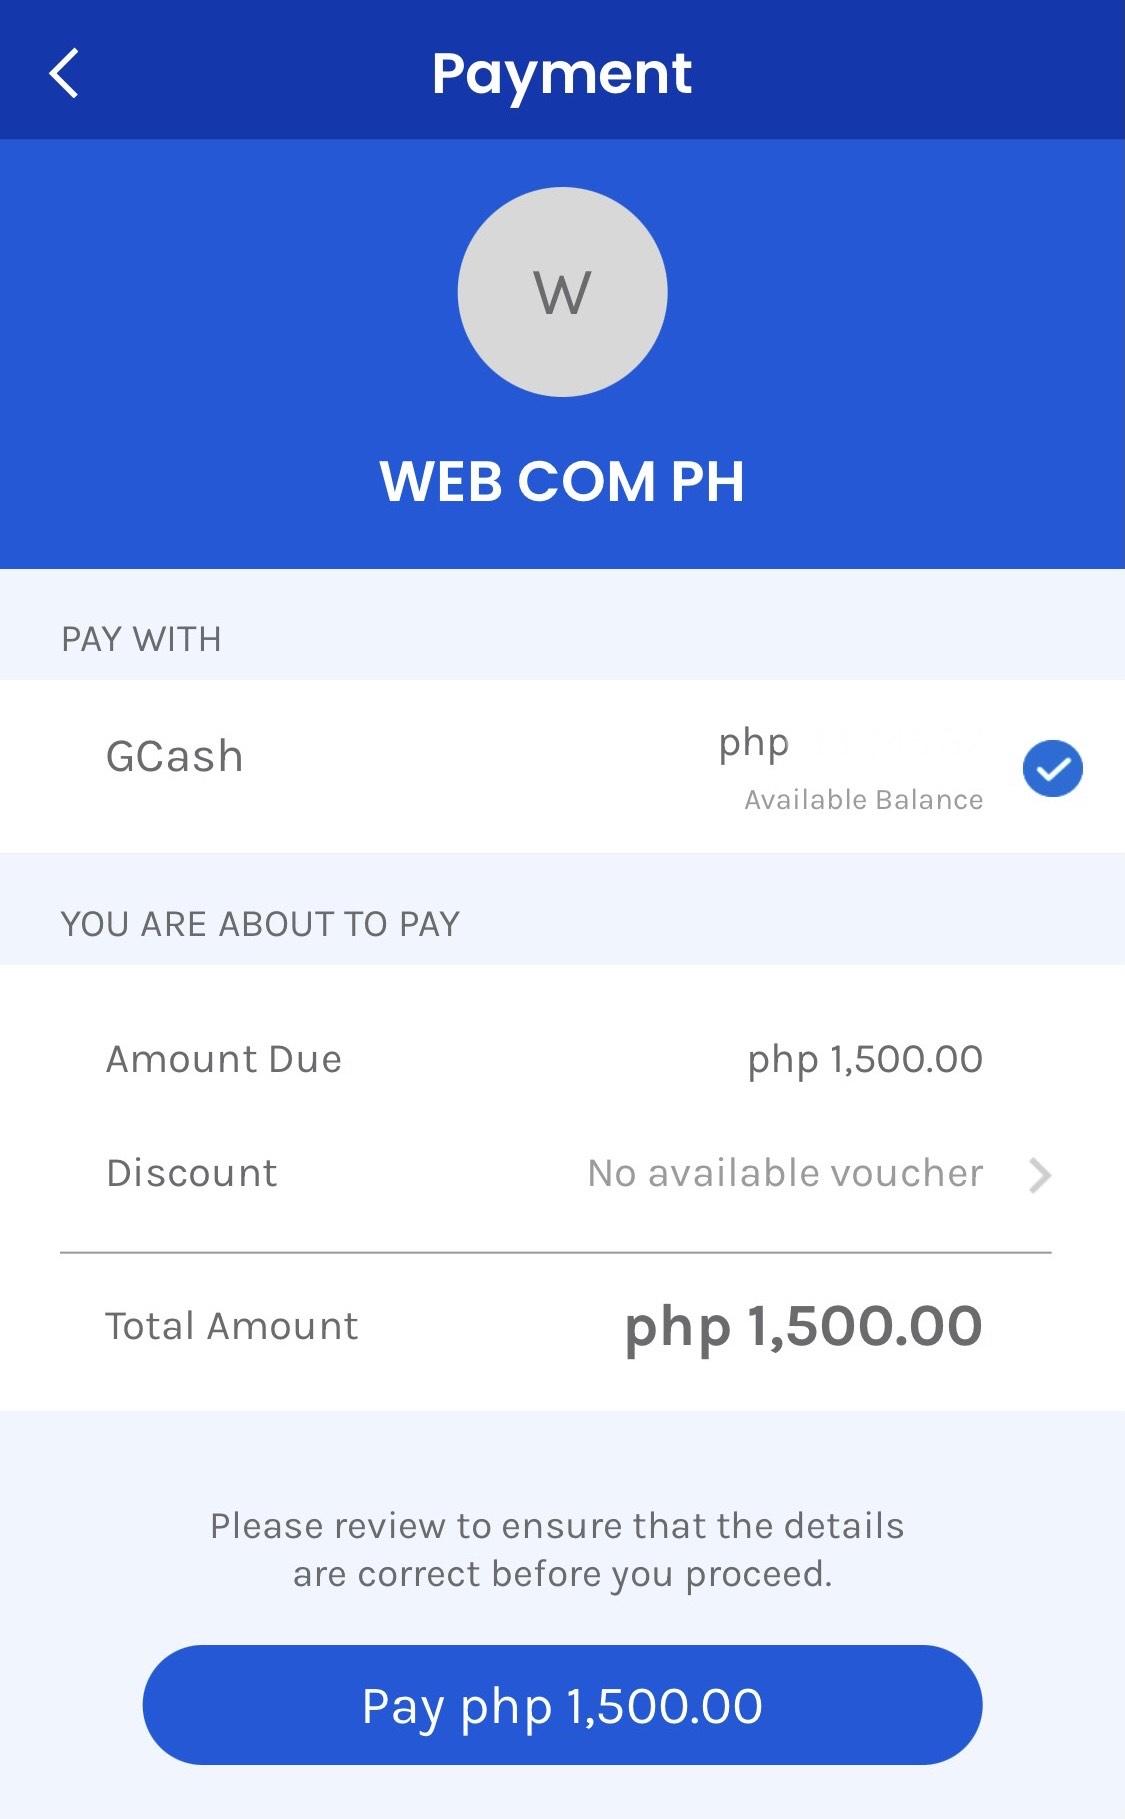 Send Payment